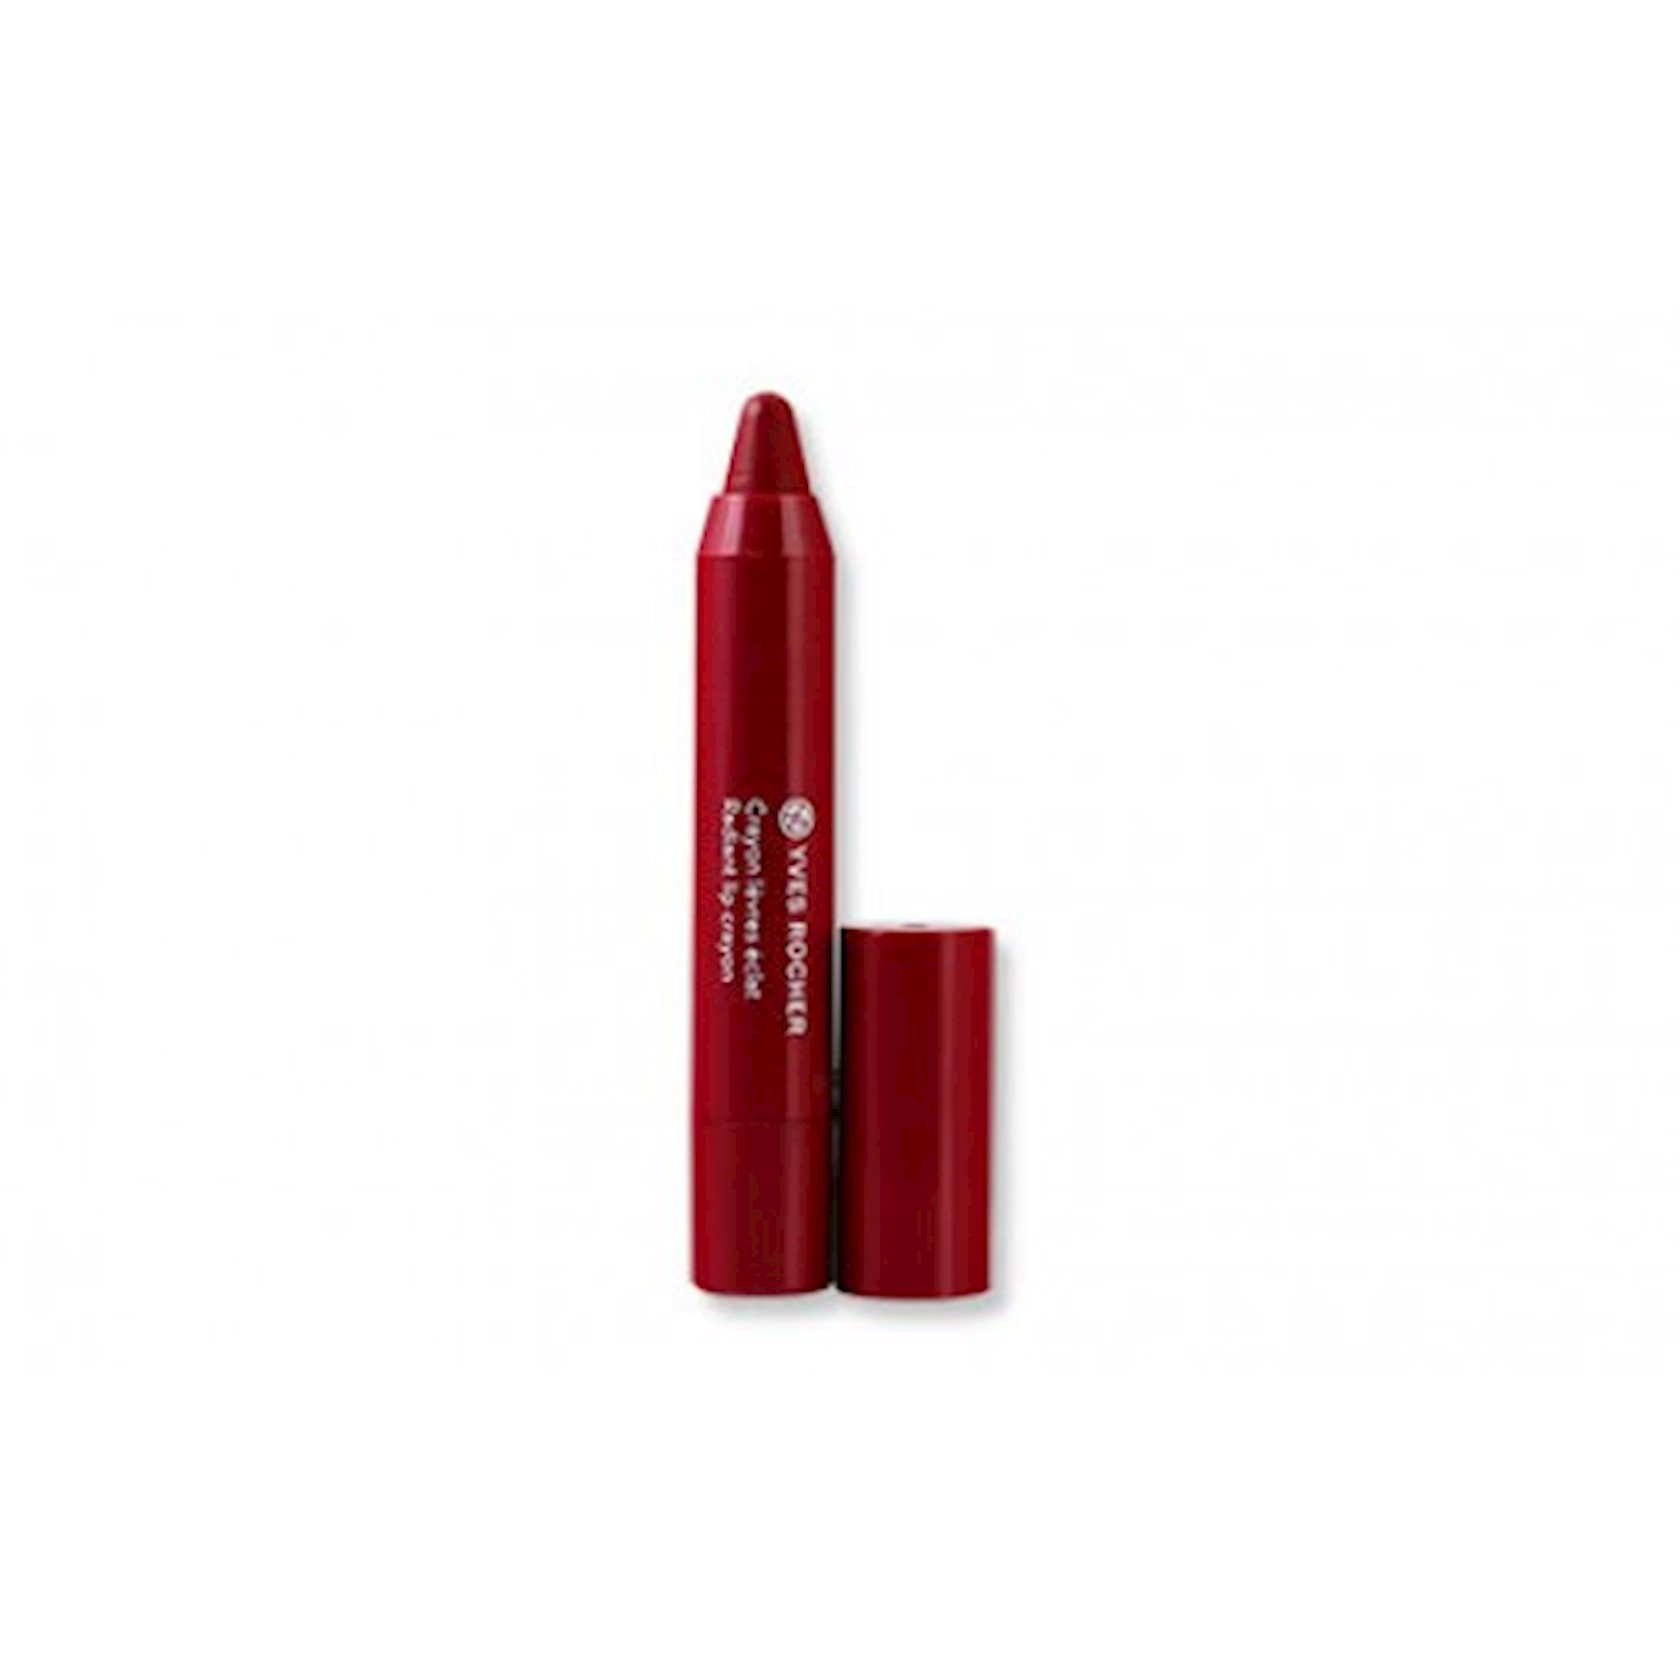 Dodaq qələmi Yves Rocher Crayon Lèvres Éclat Rouge Bordeaux 2.5